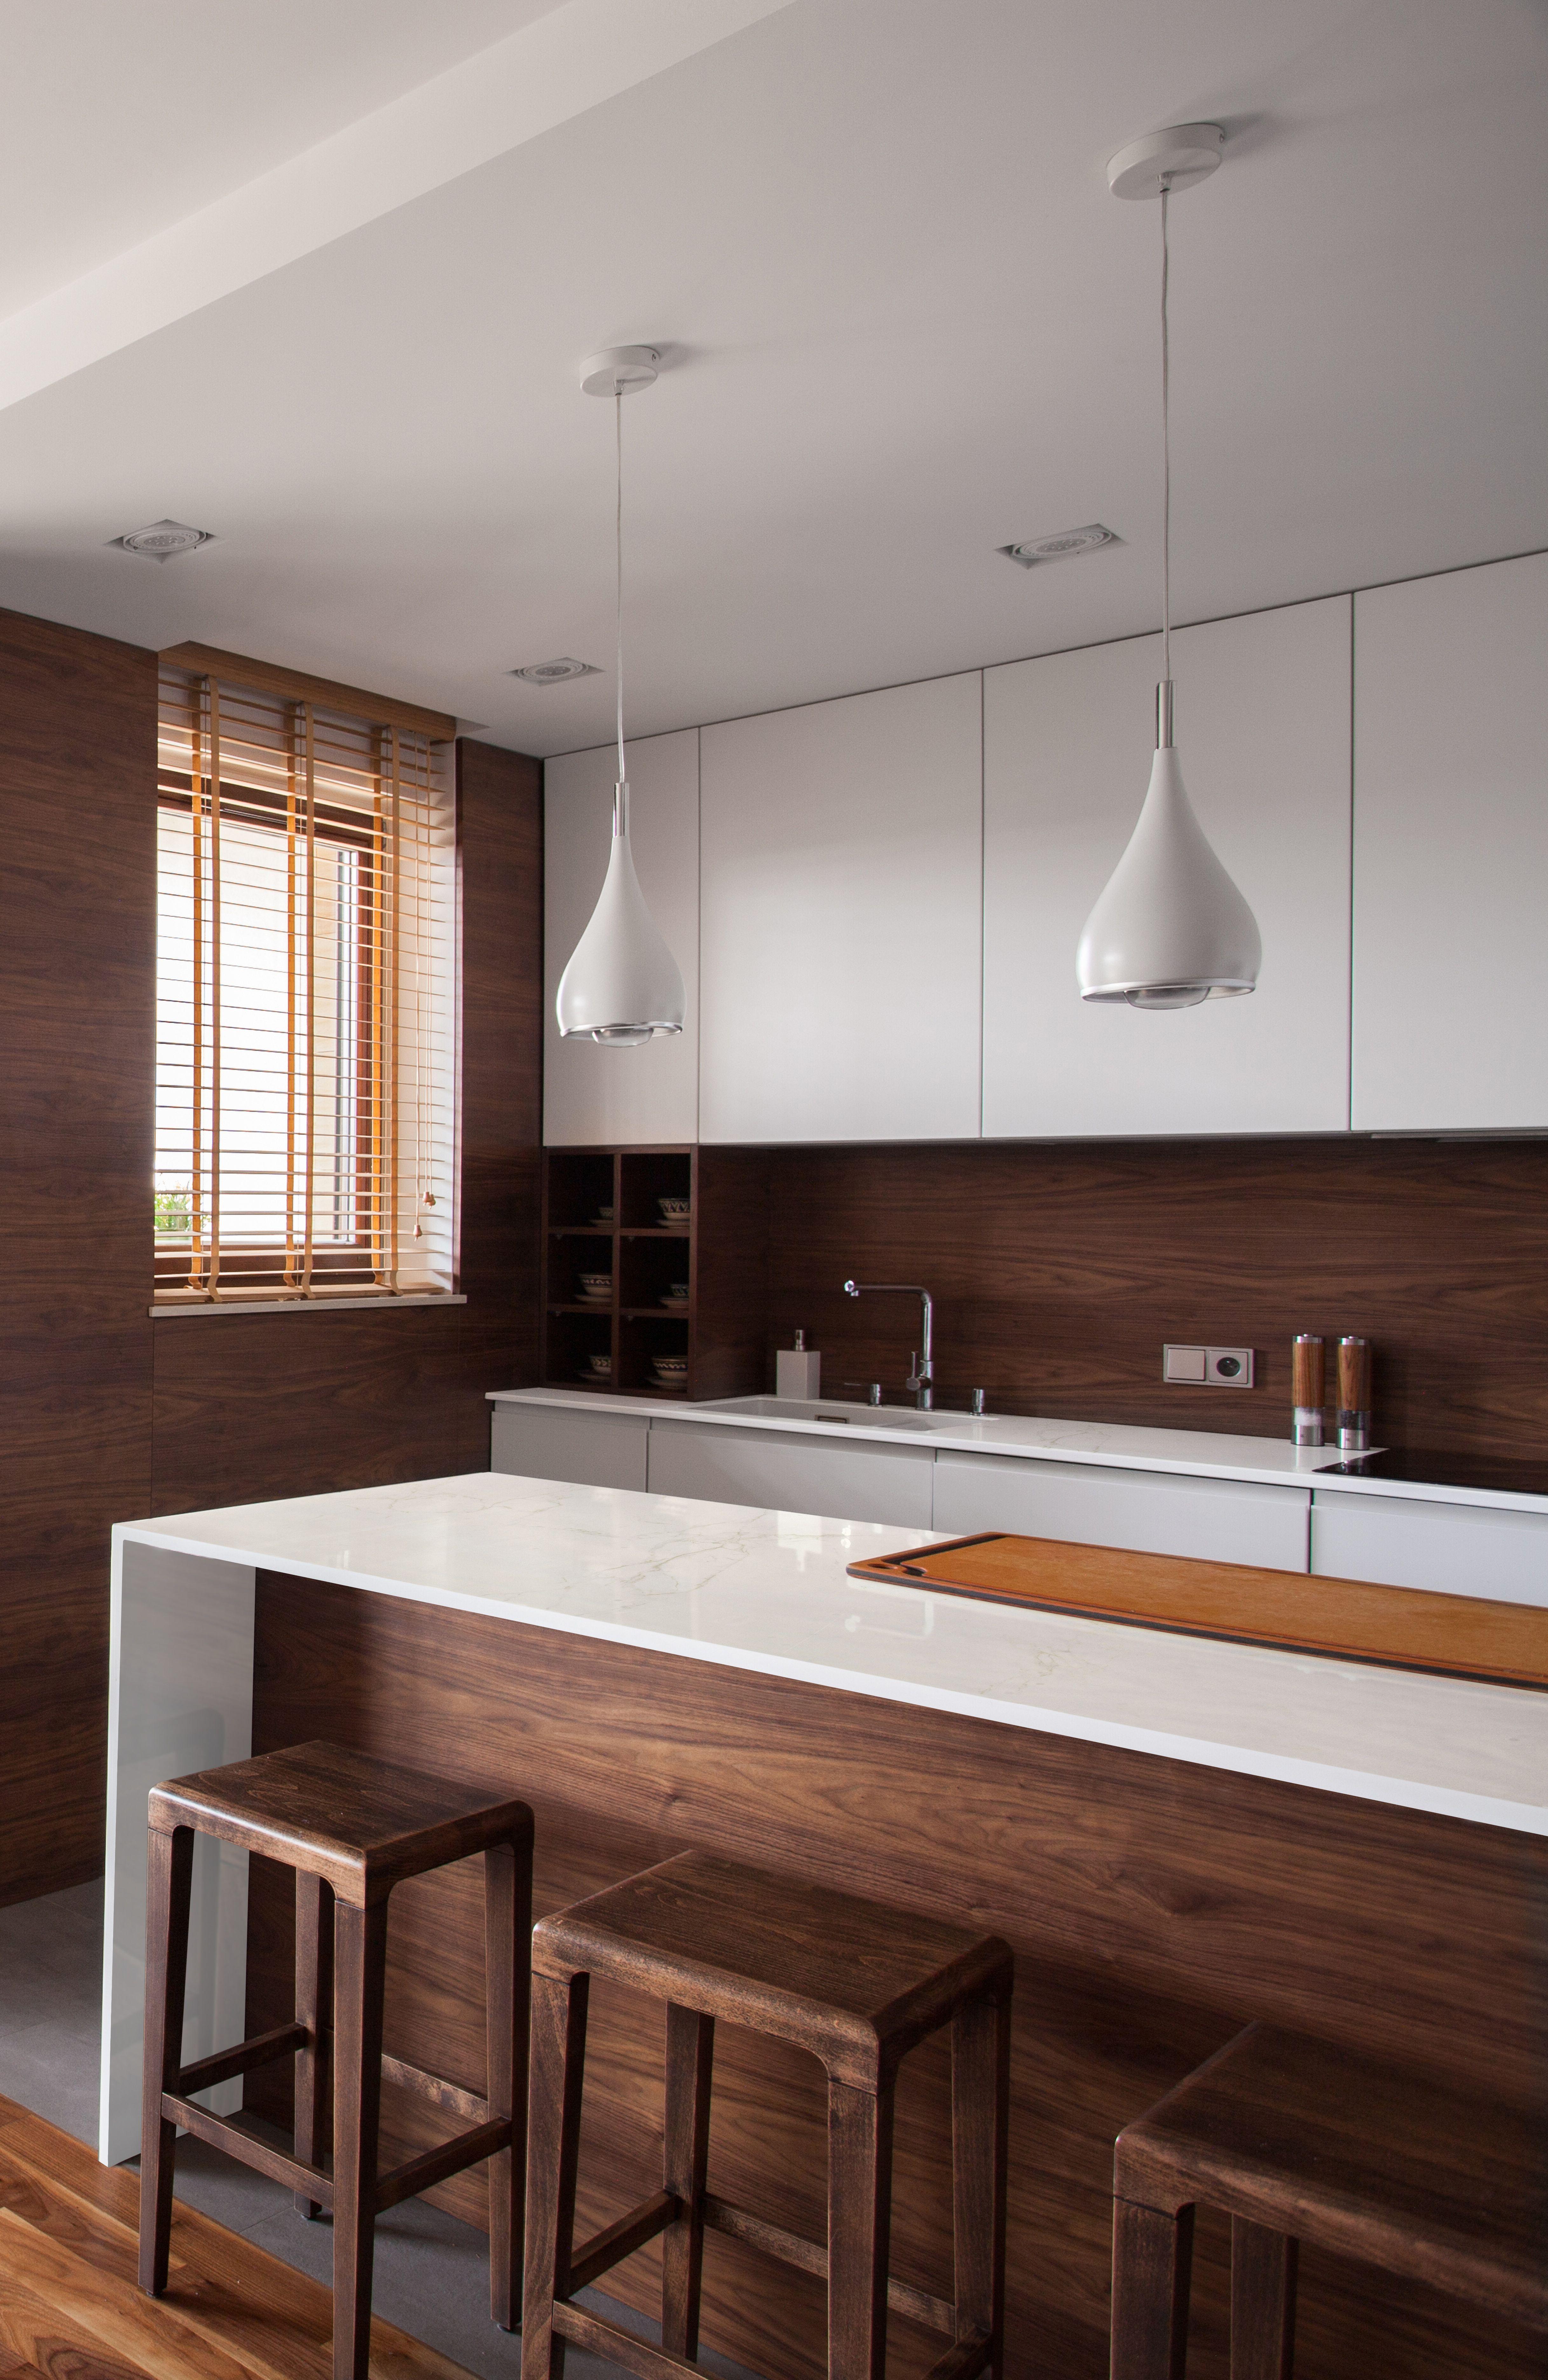 Küchenideen 2018 bilder dekton the ultracompact surfaces by in   dwell  pinterest